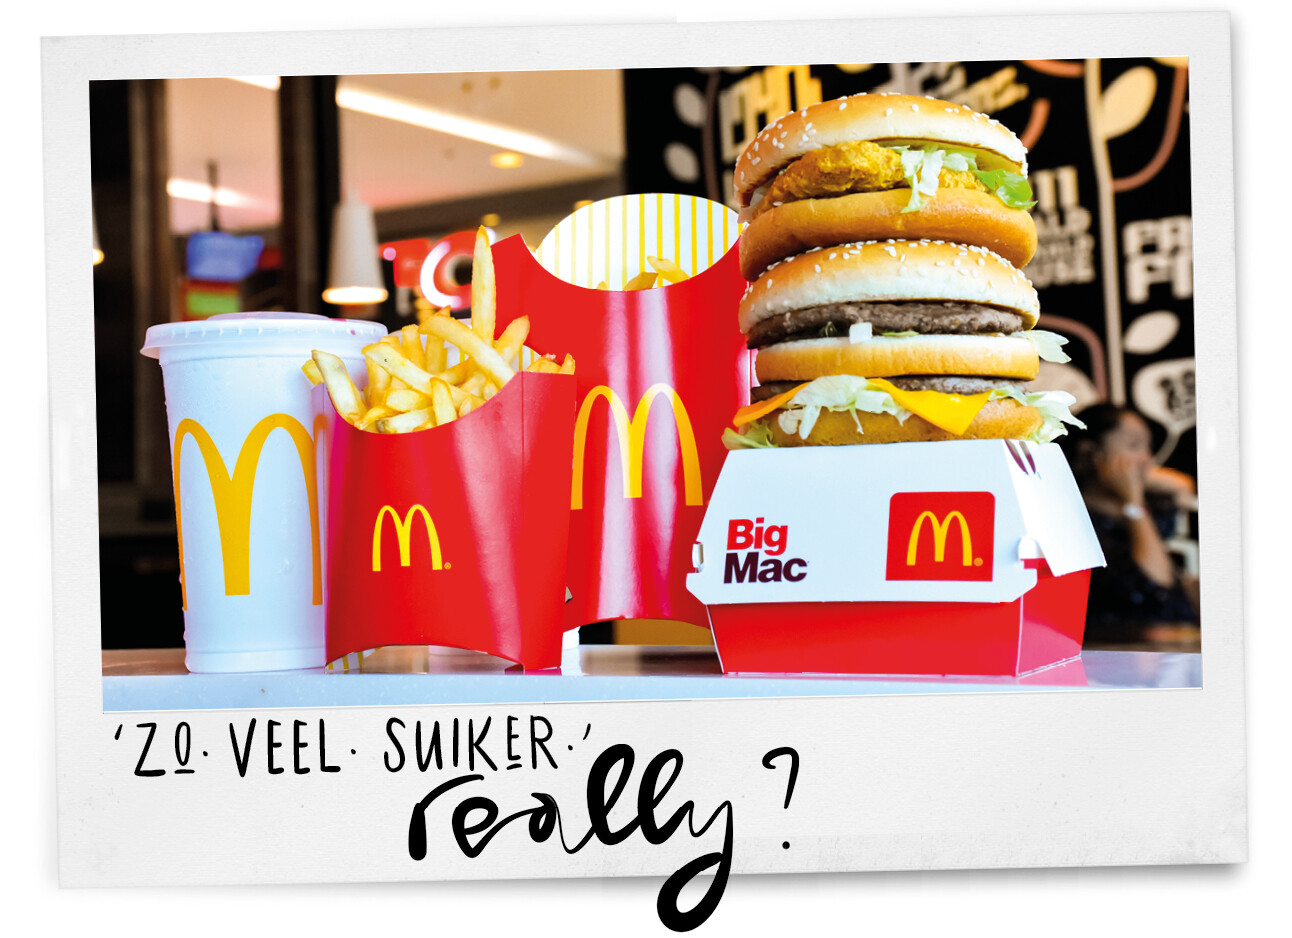 Caloriebom McDonalds